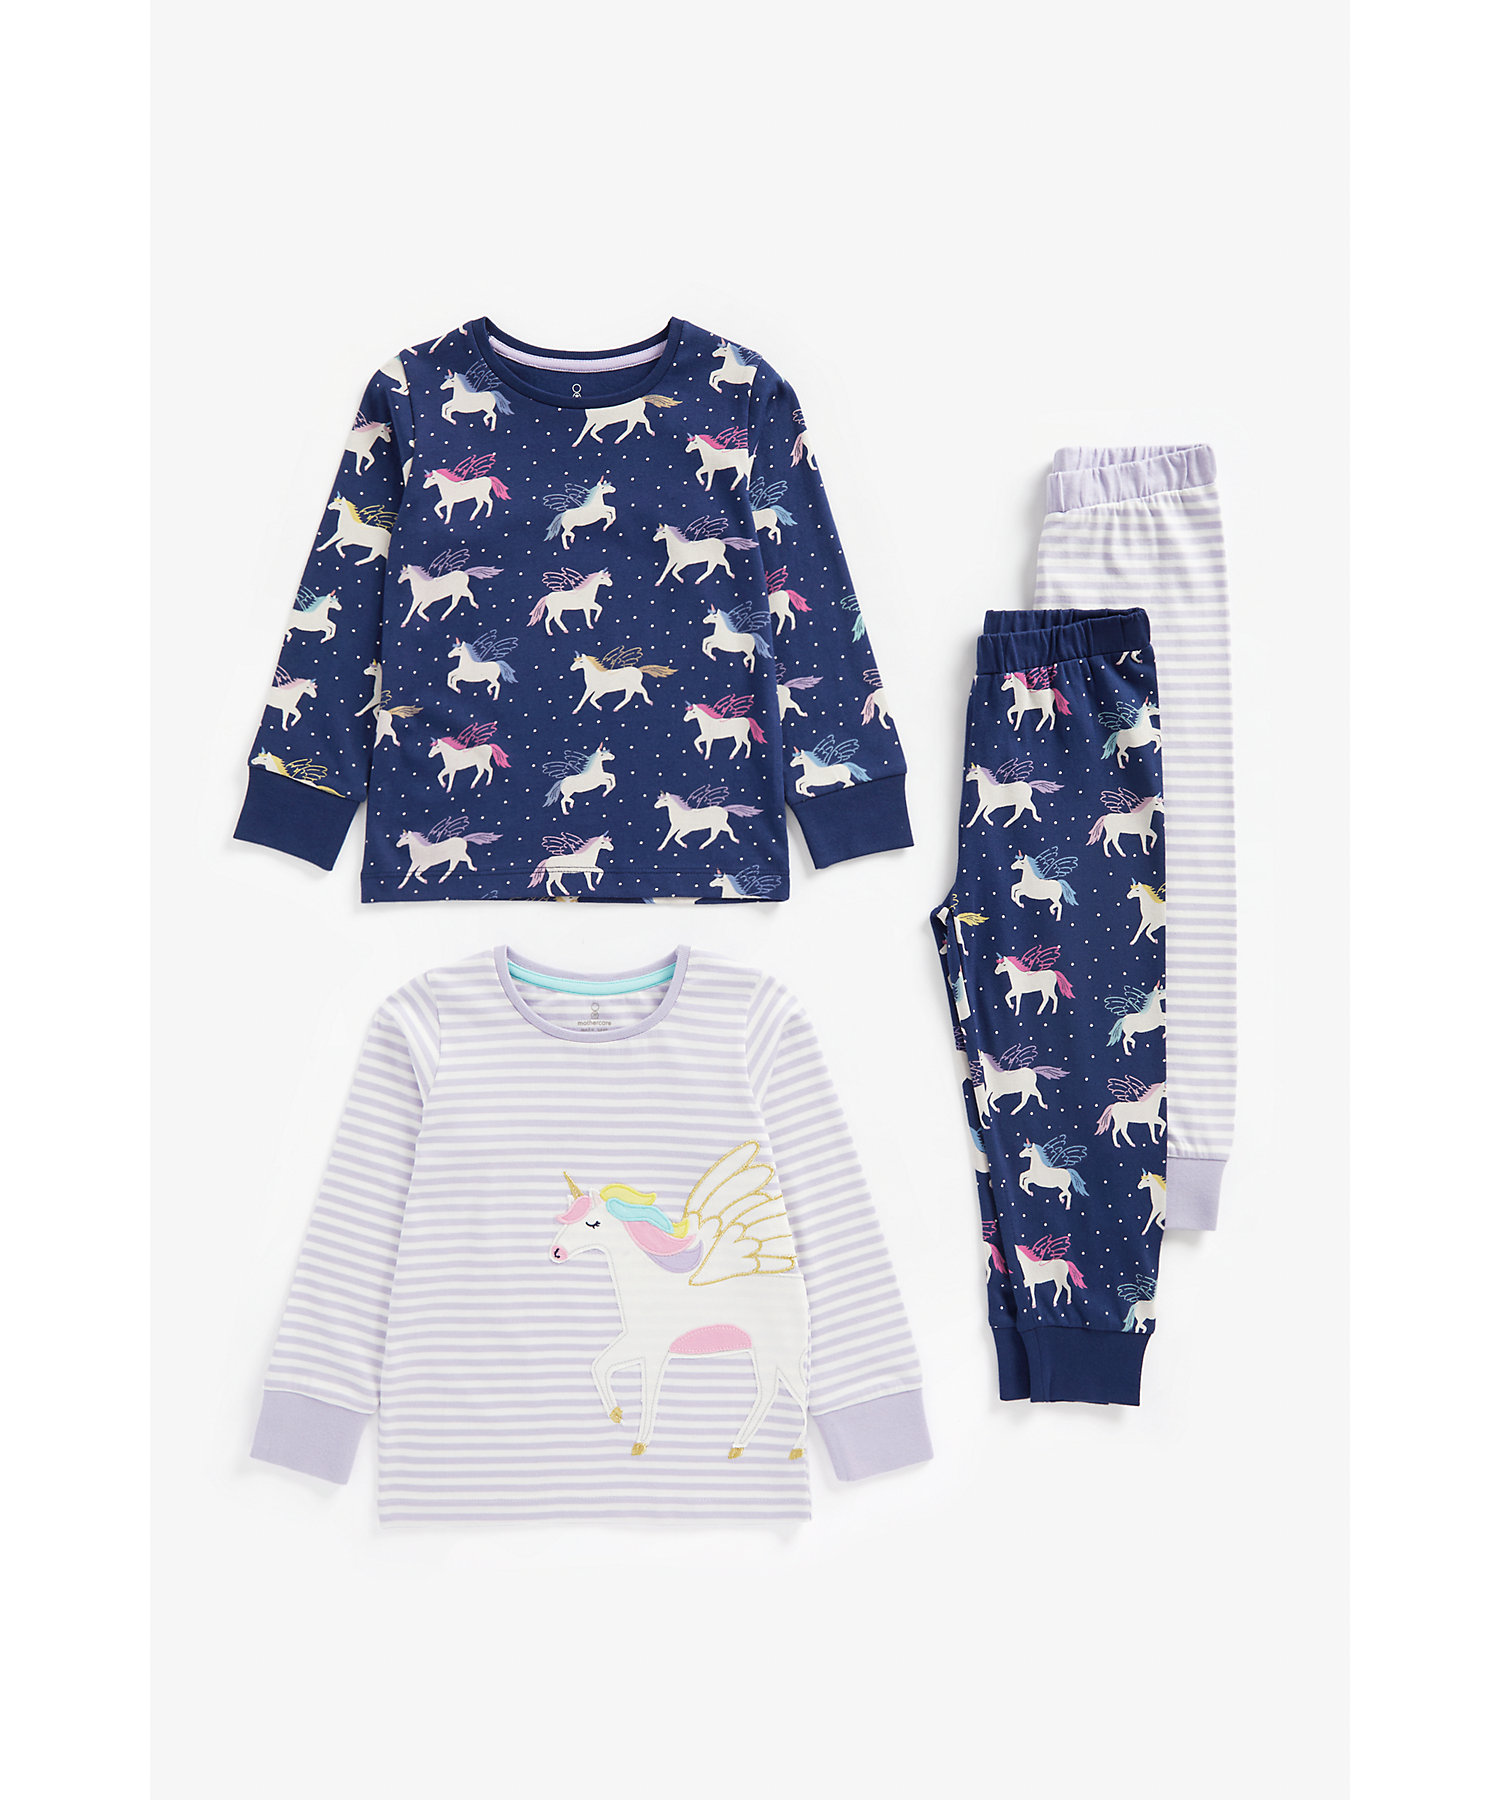 Mothercare | Girls Full Sleeves Pyjama Set Unicorn Patchwork - Pack Of 2 - Multicolor